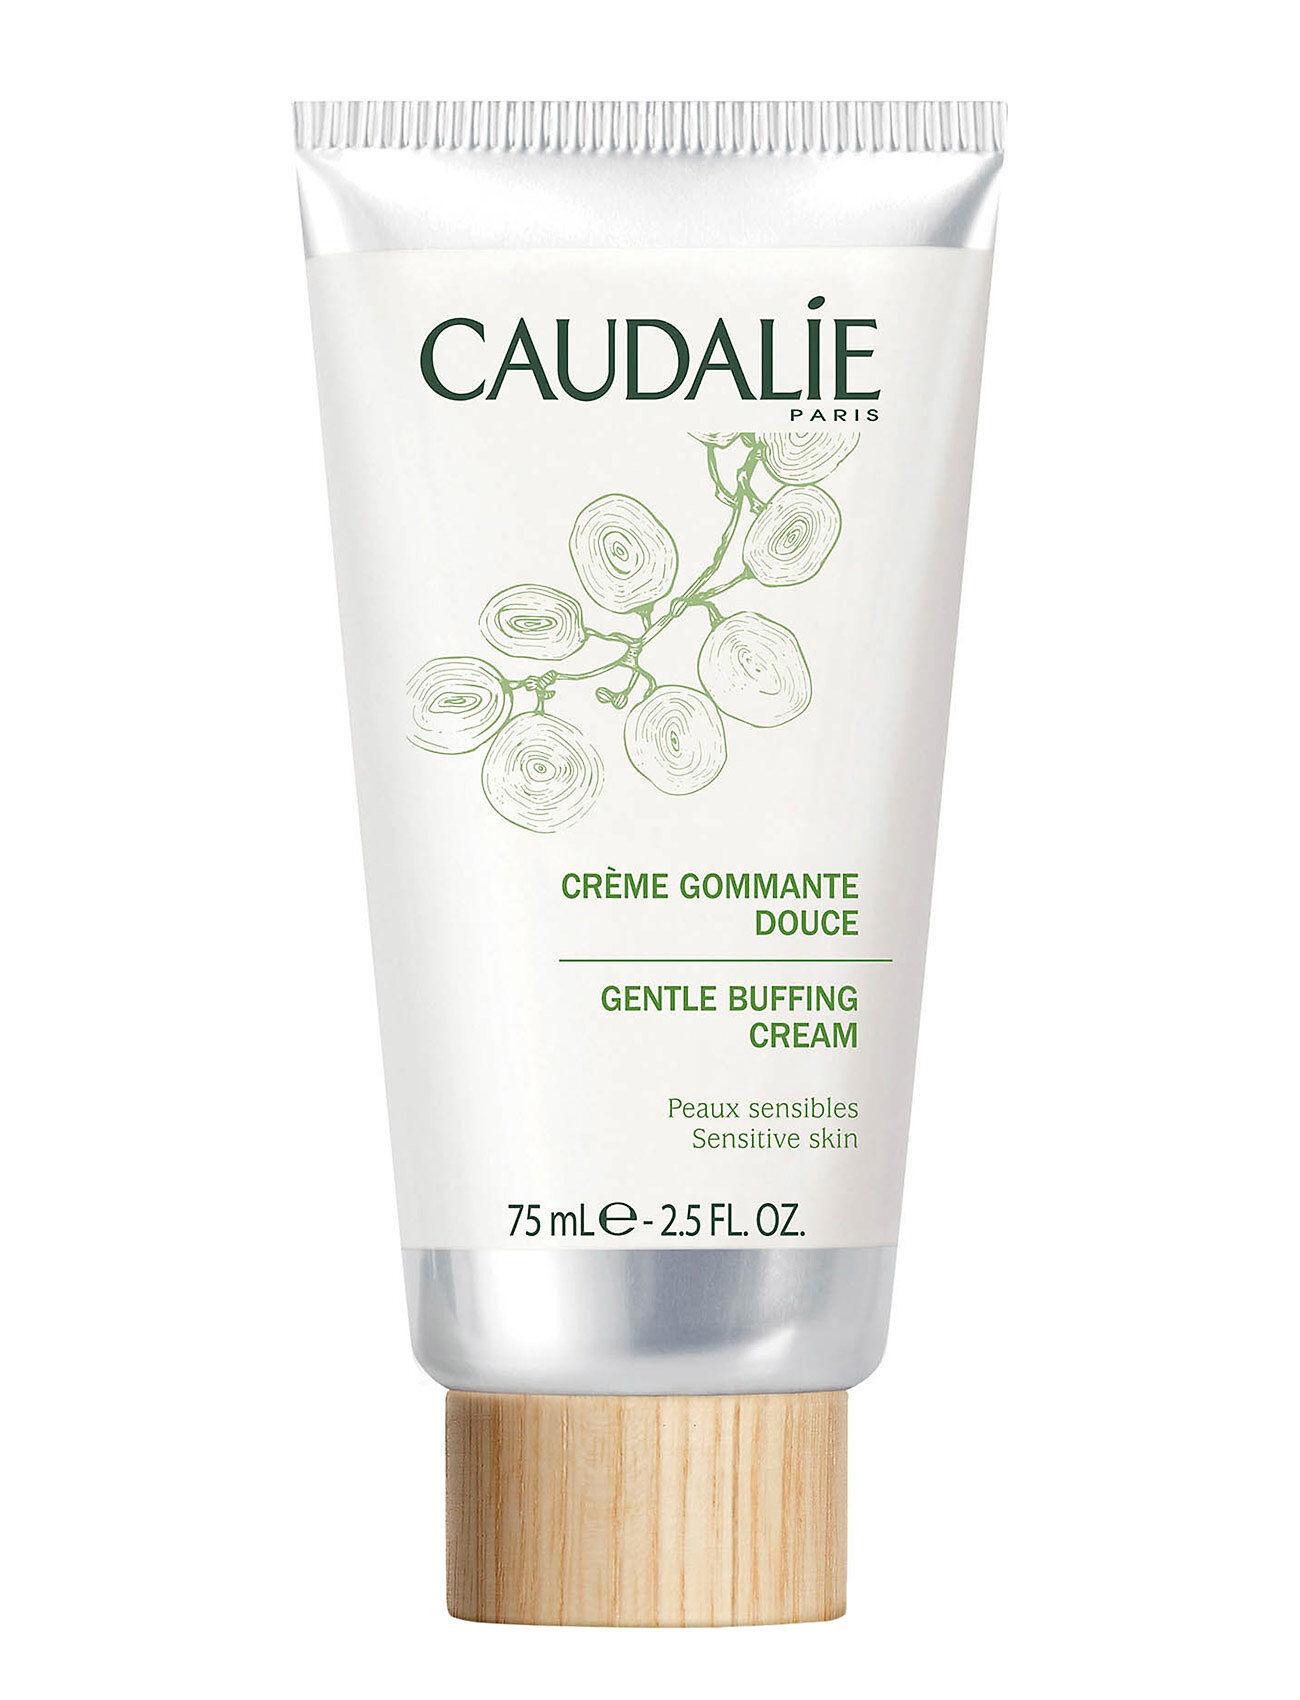 CAUDALIE Gentle Buffing Cream Kuorinta-aine Kasvojen Kuorinta Nude CAUDALIE